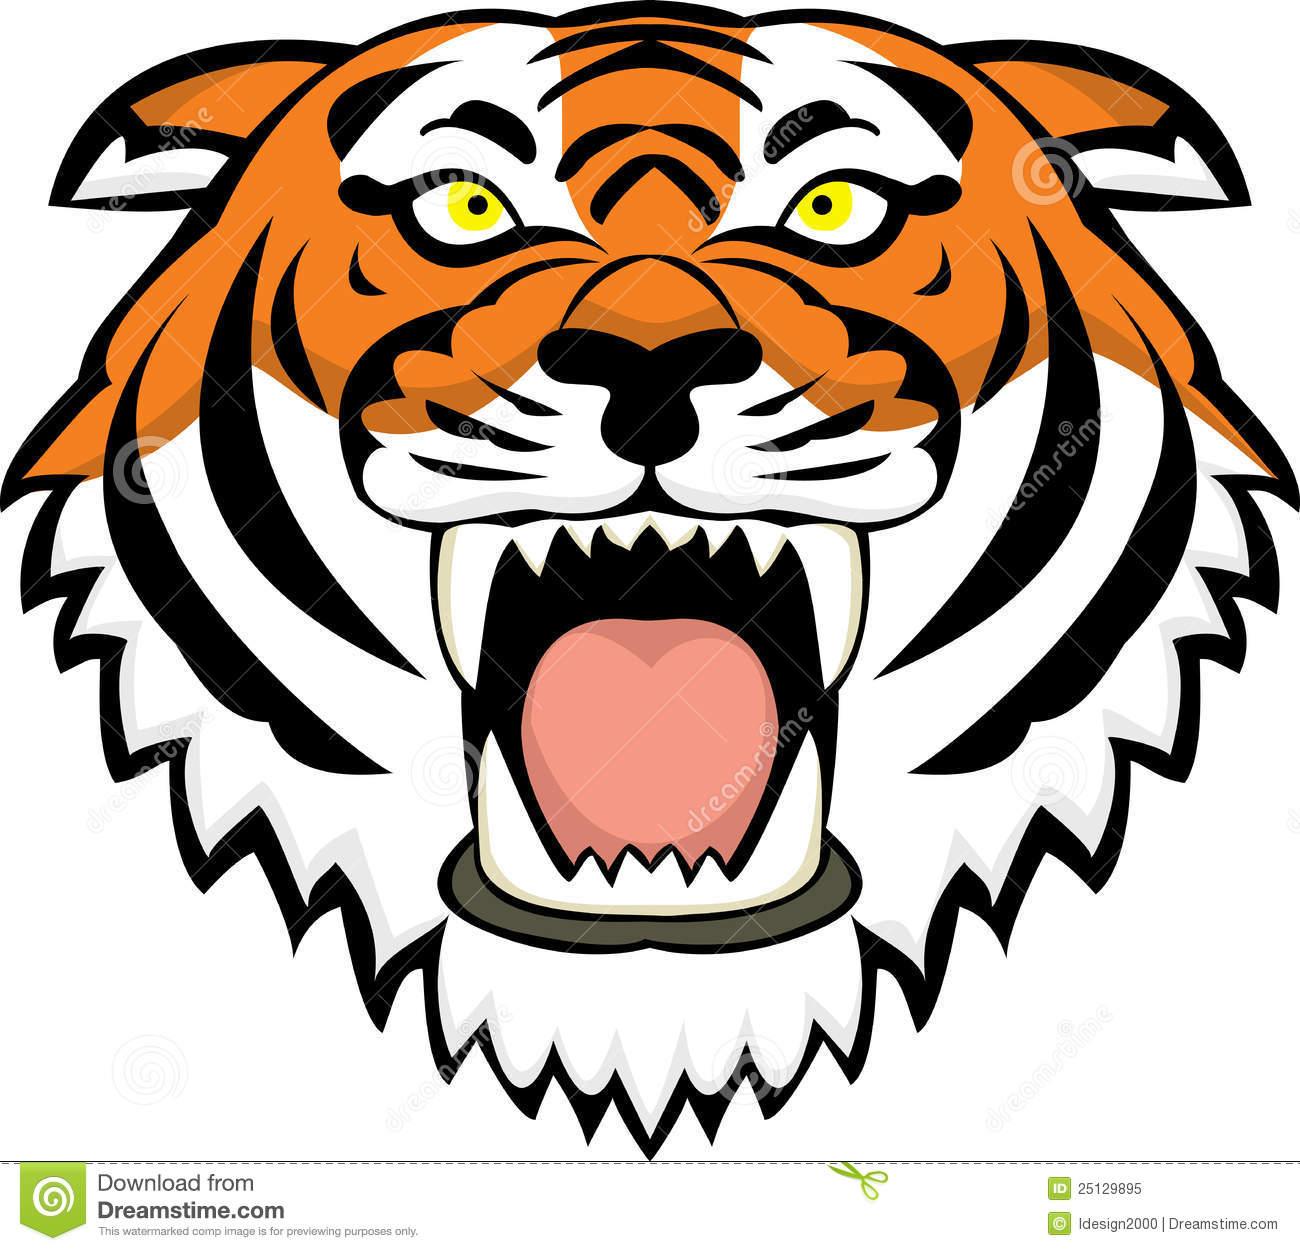 tiger face clip art color